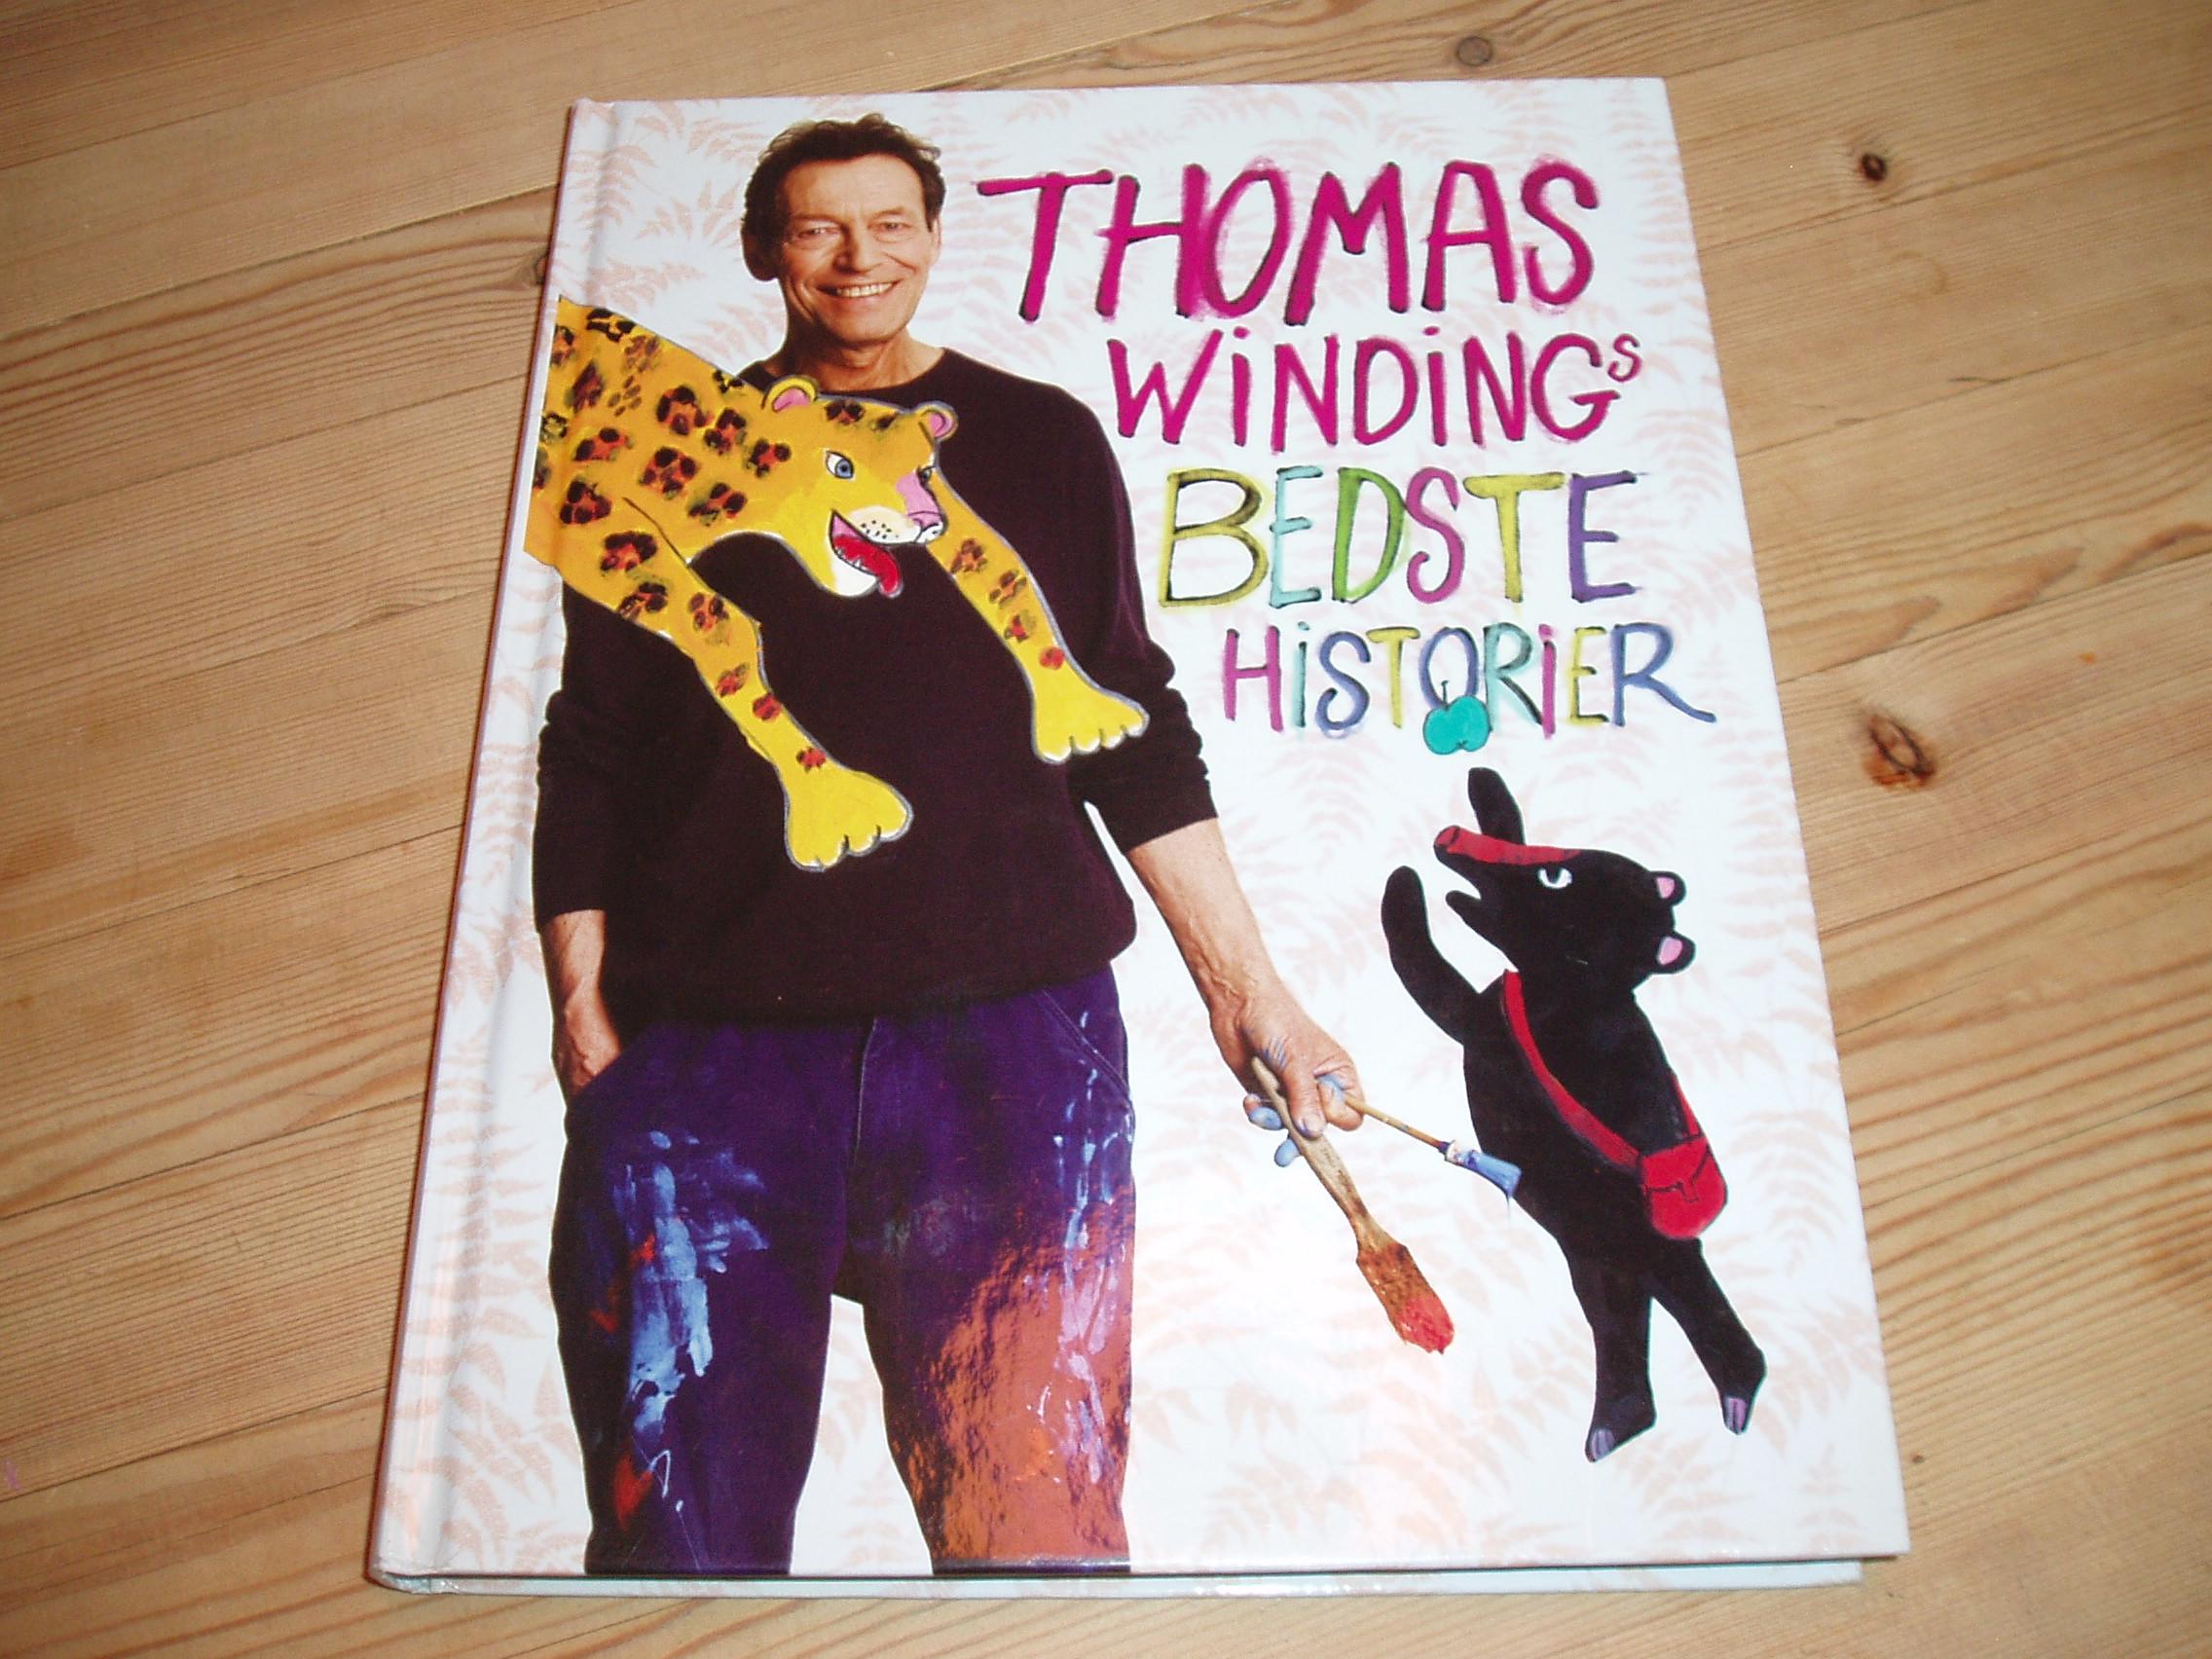 Thomas Windings bedste historier. Med CD. Illustreret